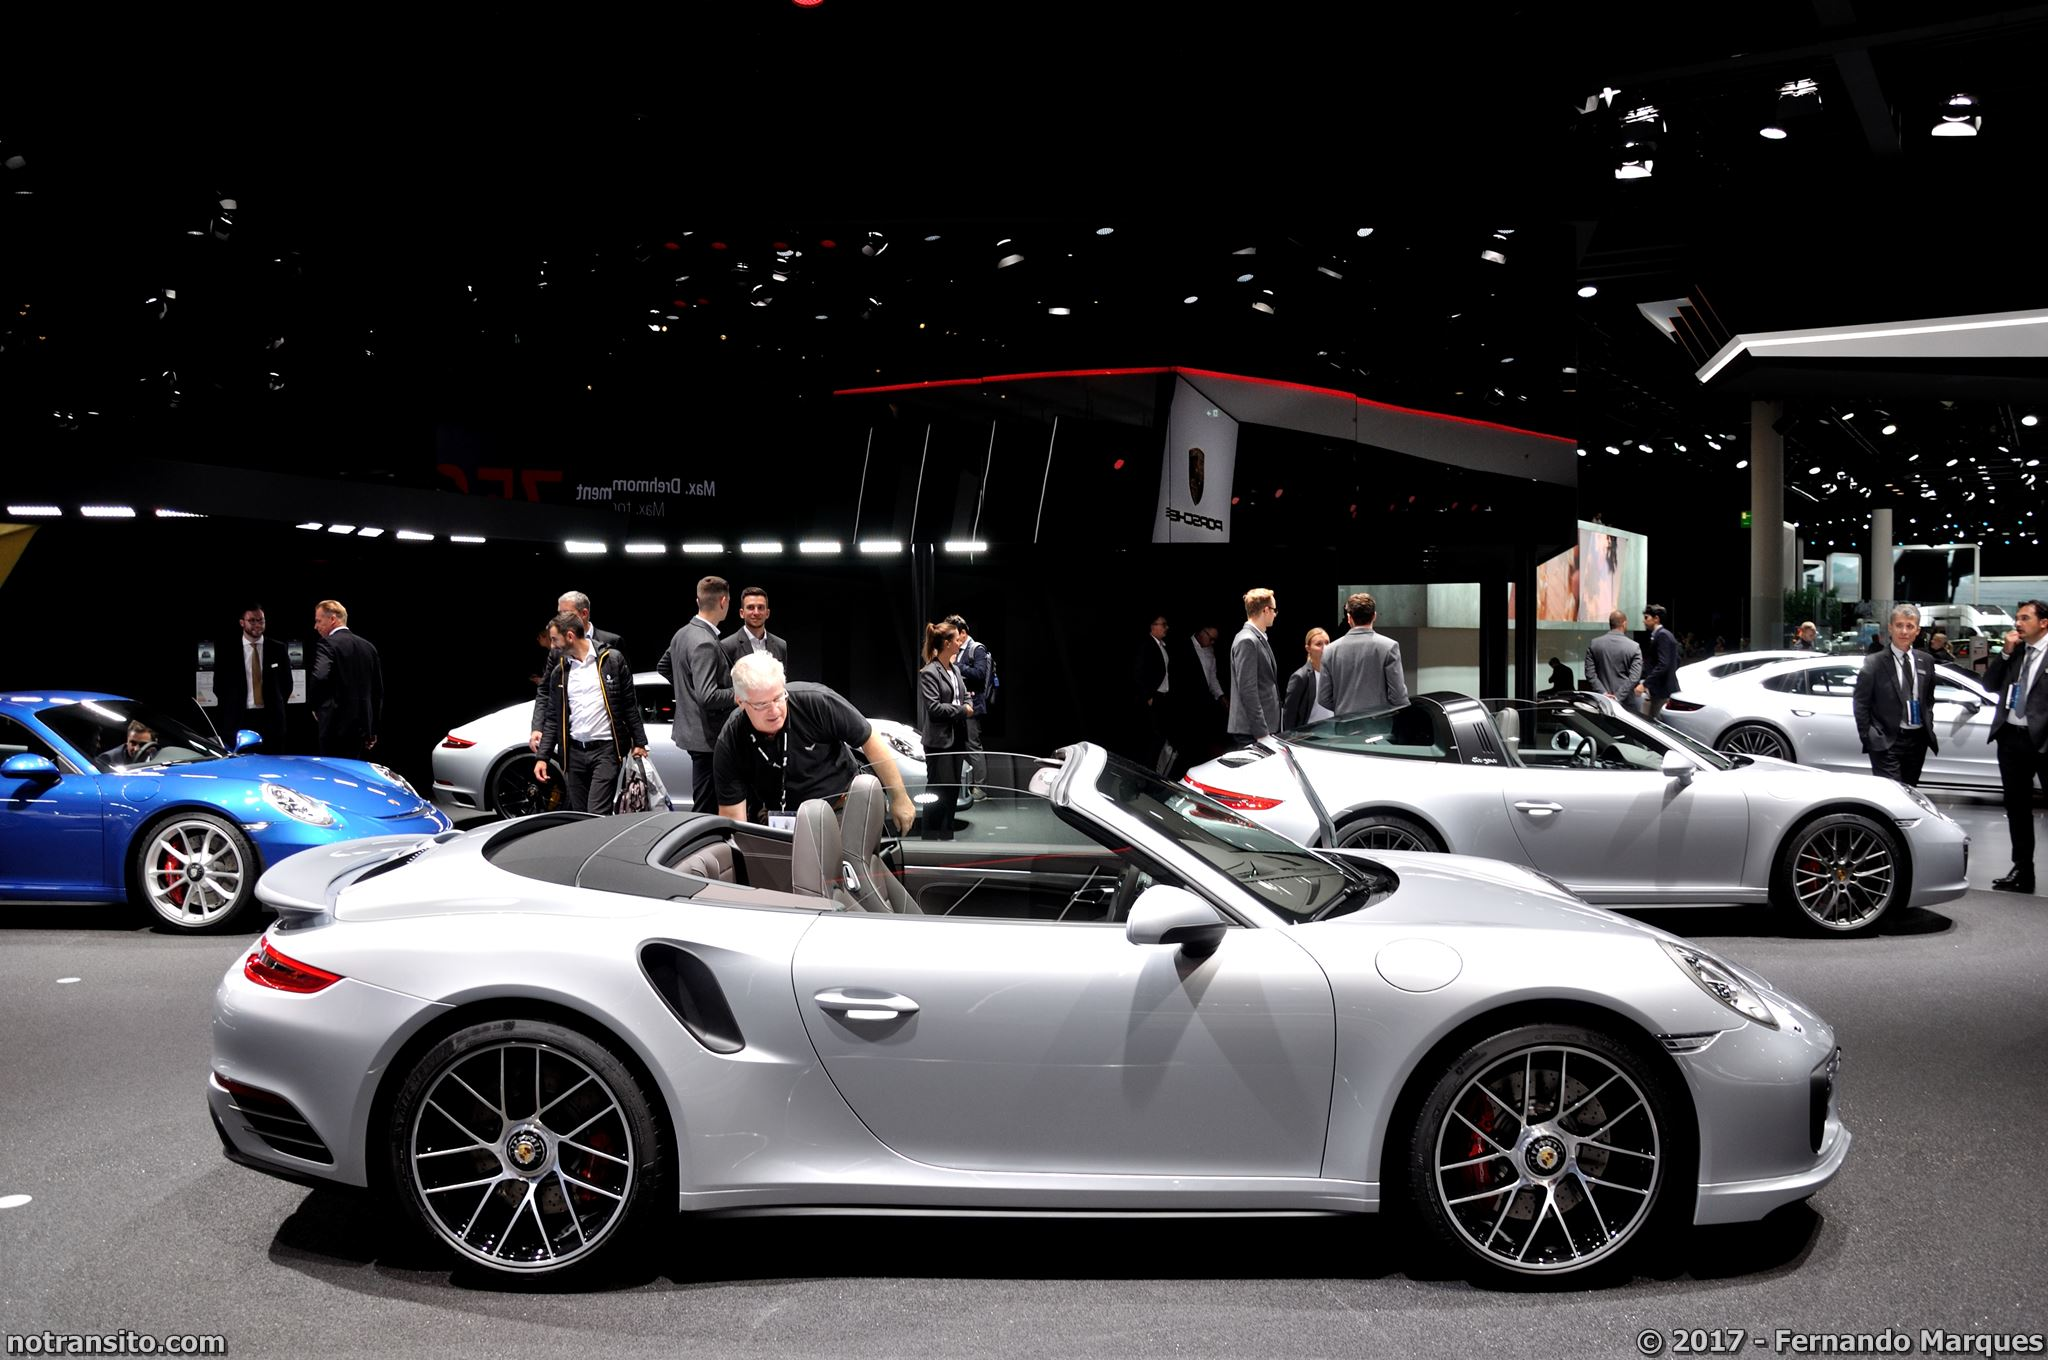 Porsche-911-Turbo-S-Cabriolet-Frankfurt-2017-003